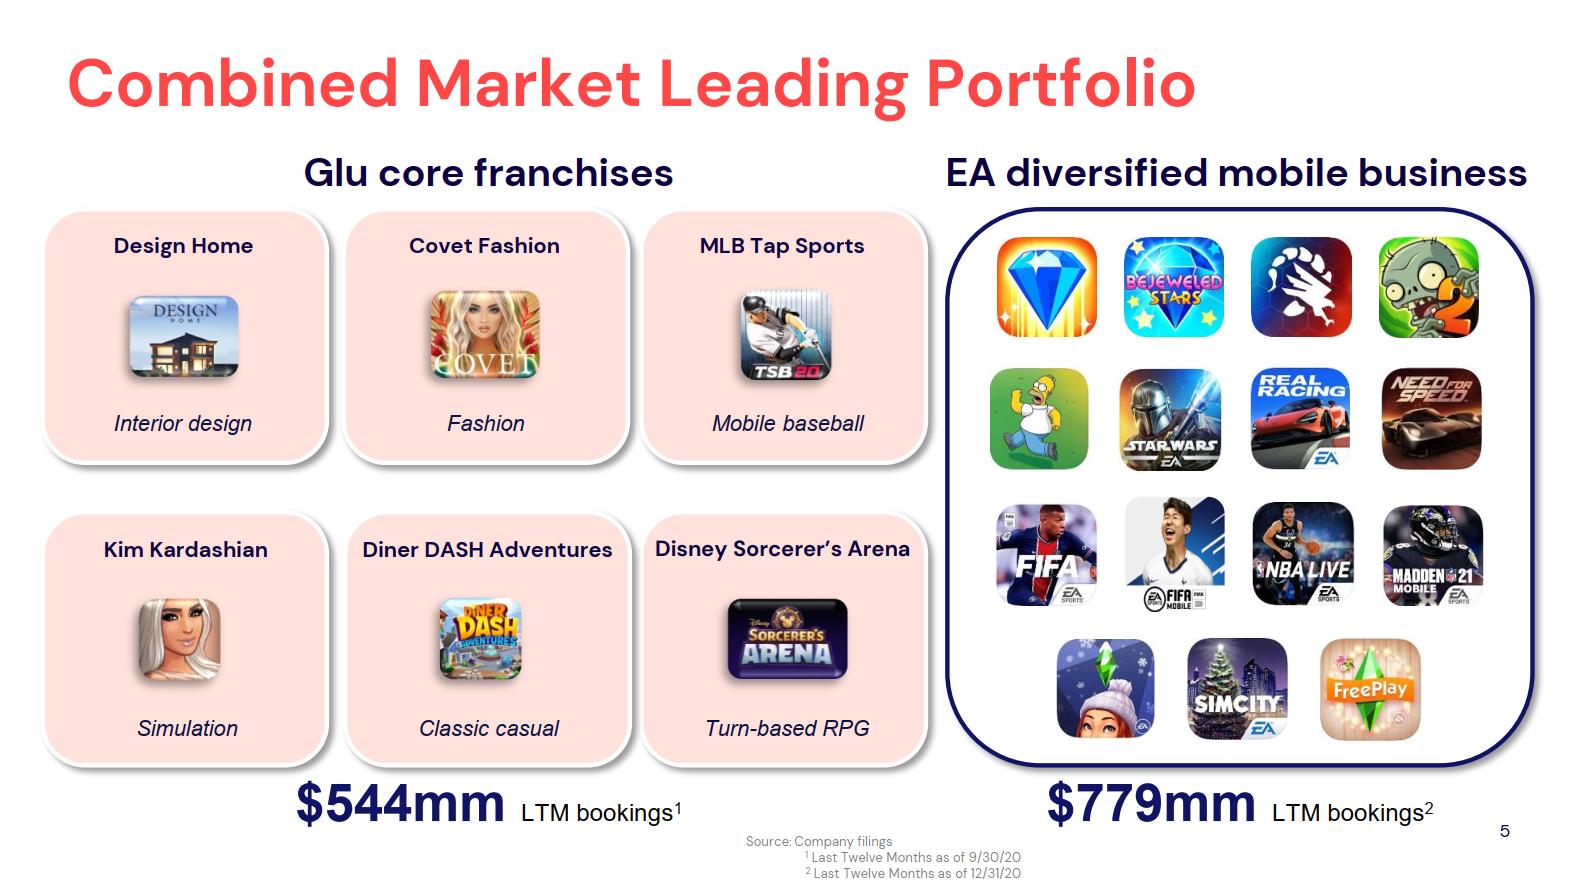 Игры Glu mobile и EA